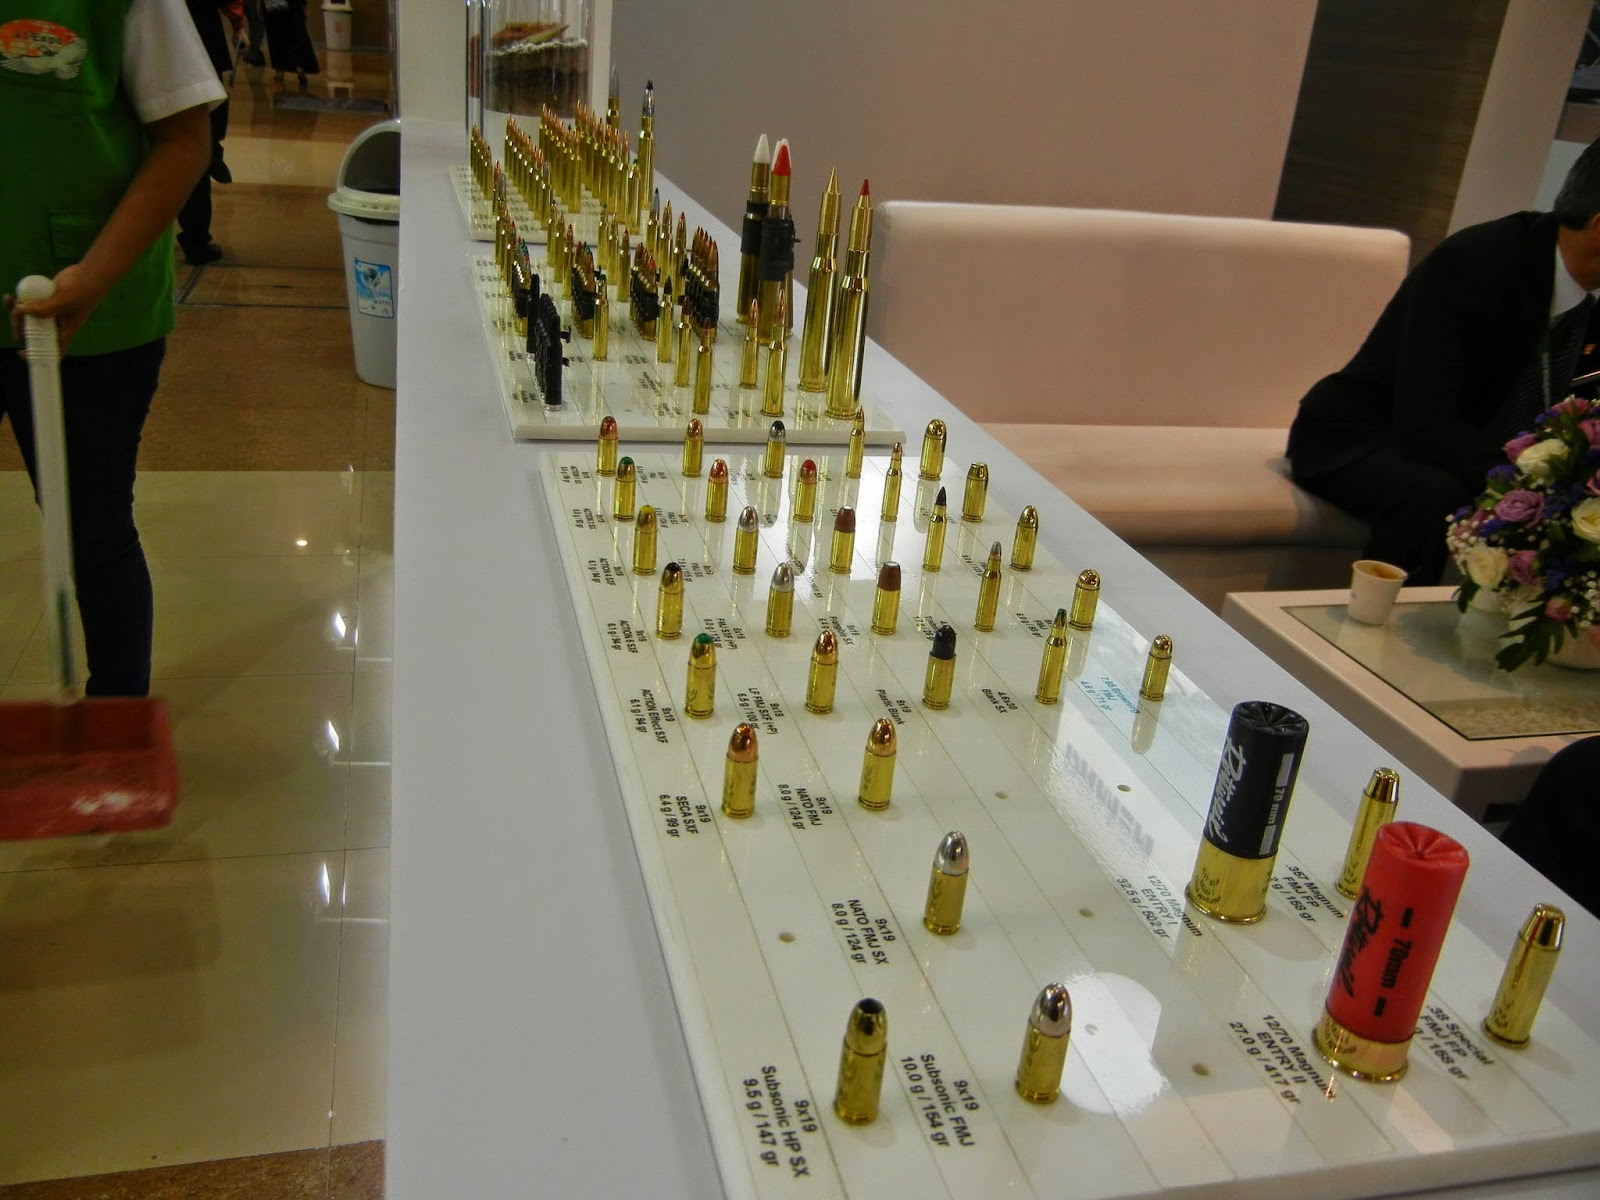 RUAG Ammotec exhibiting their ammunition